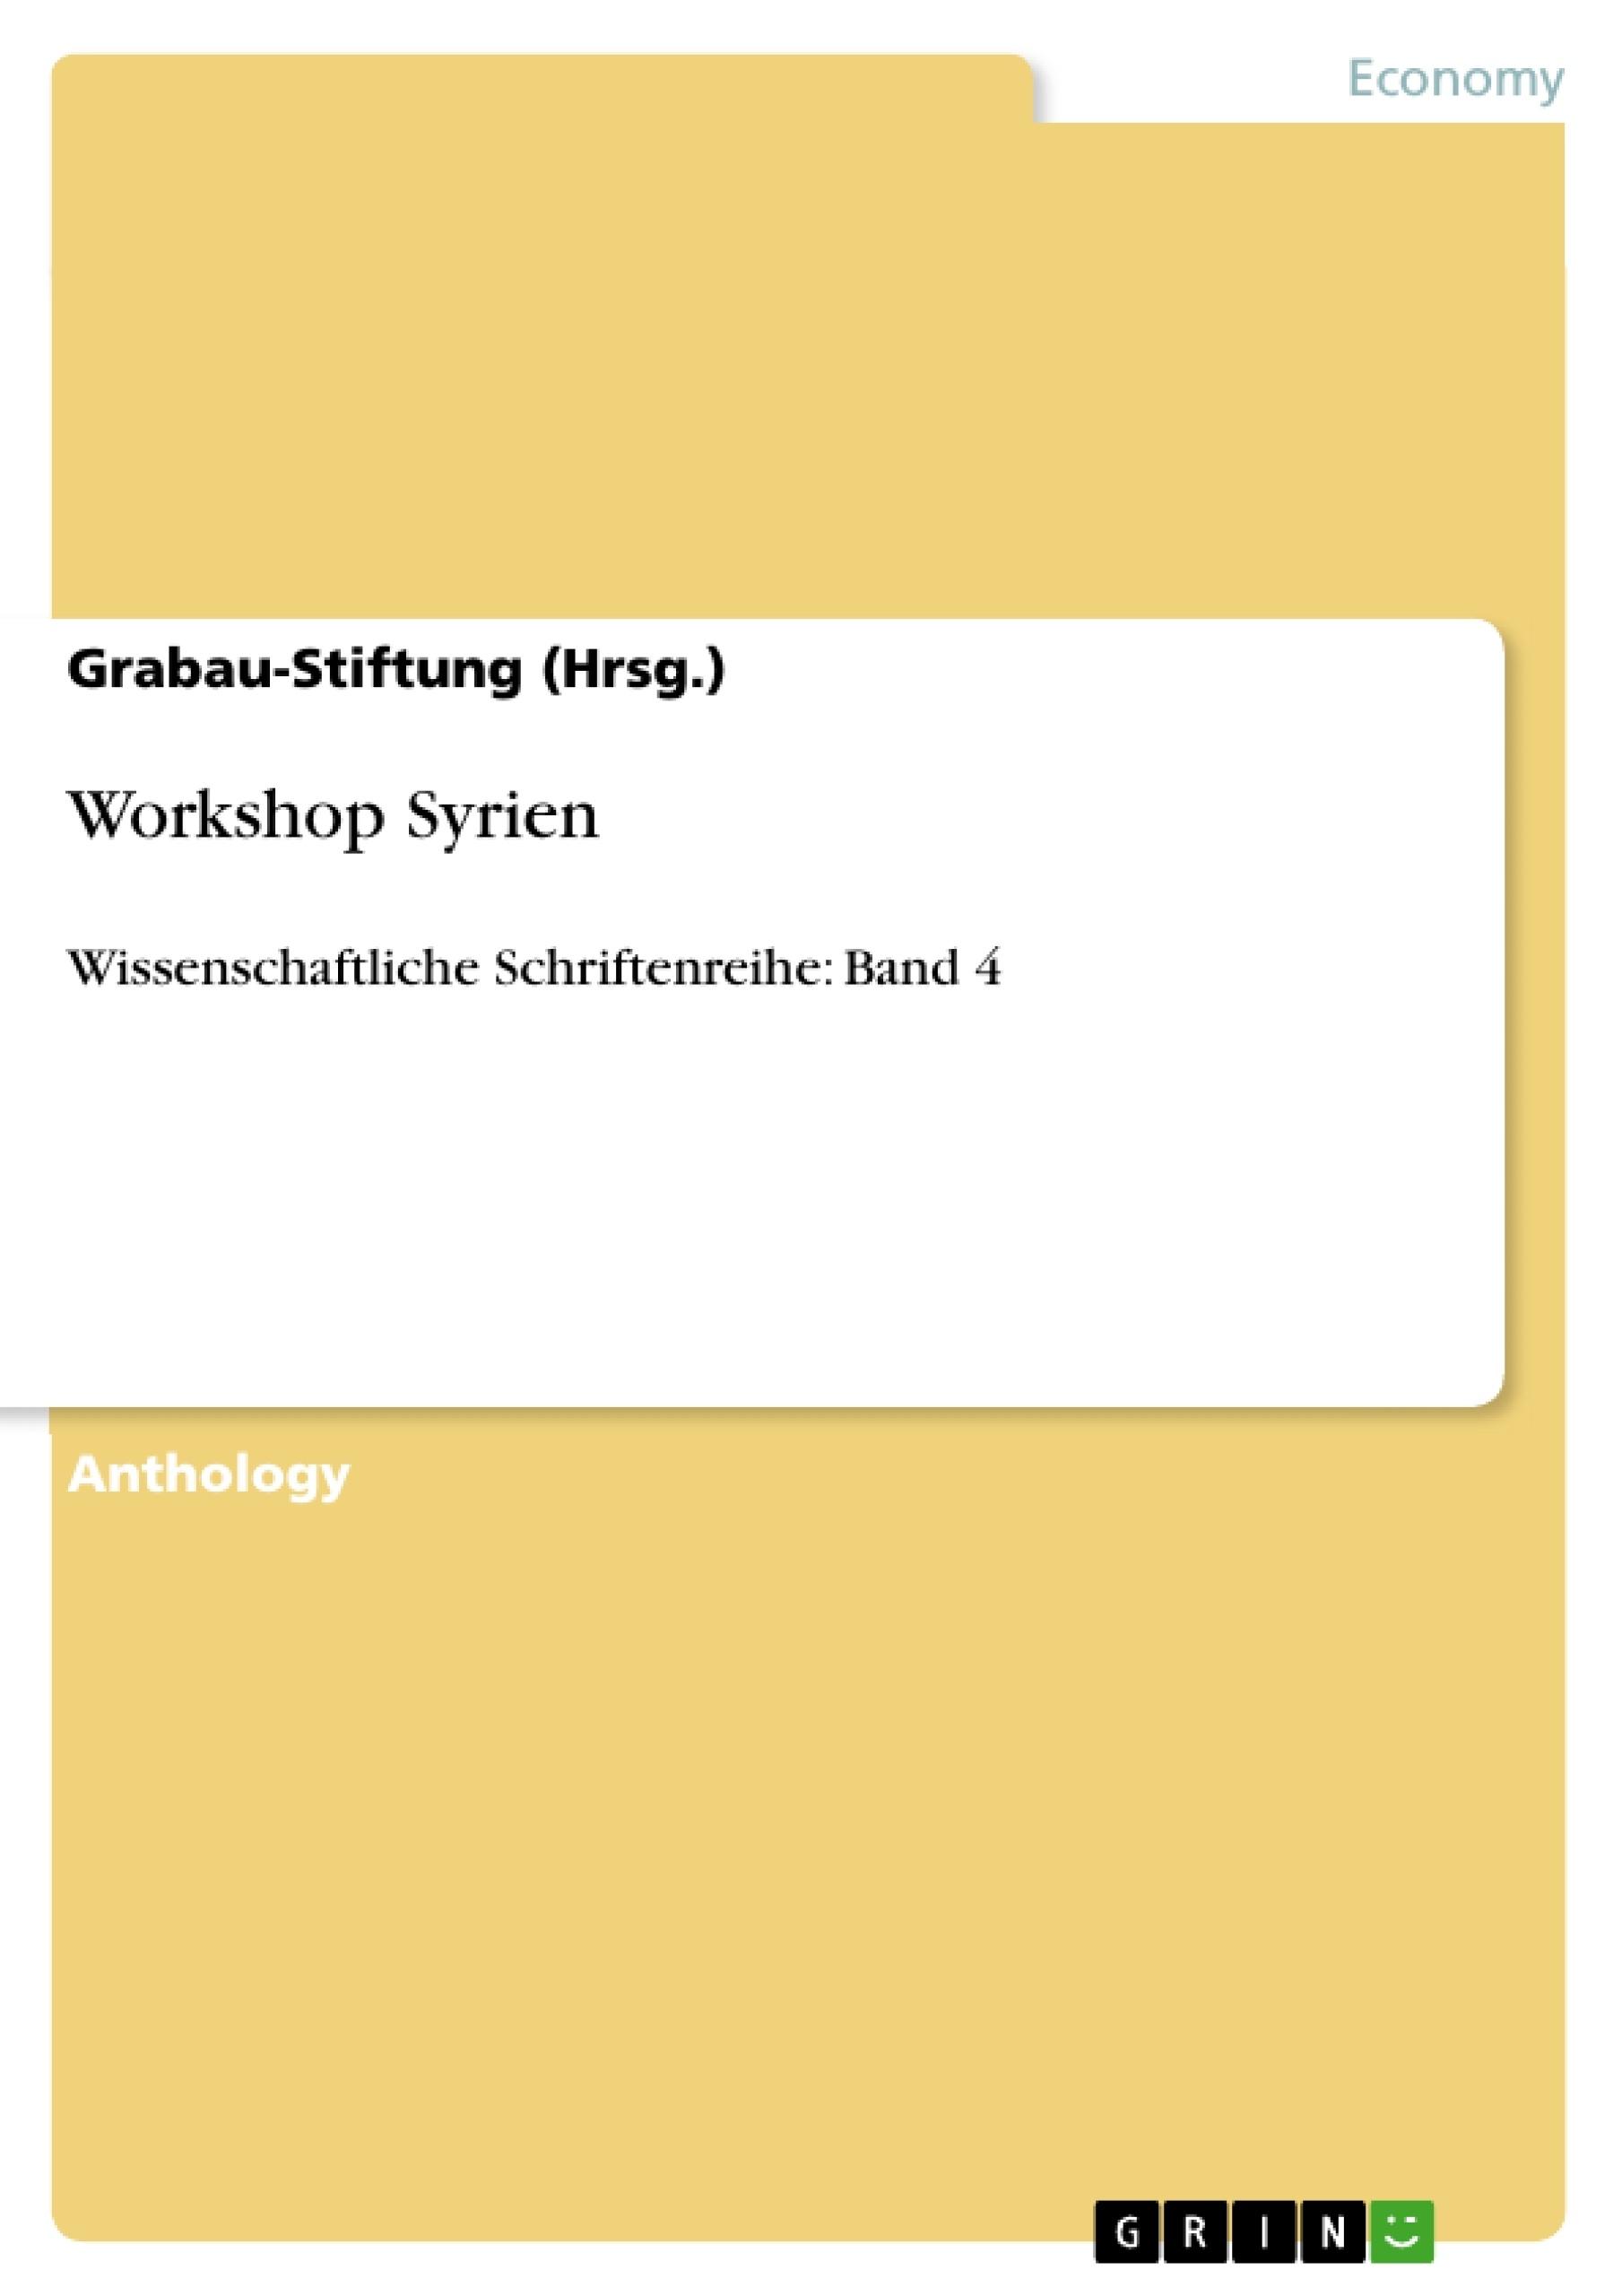 Title: Workshop Syrien